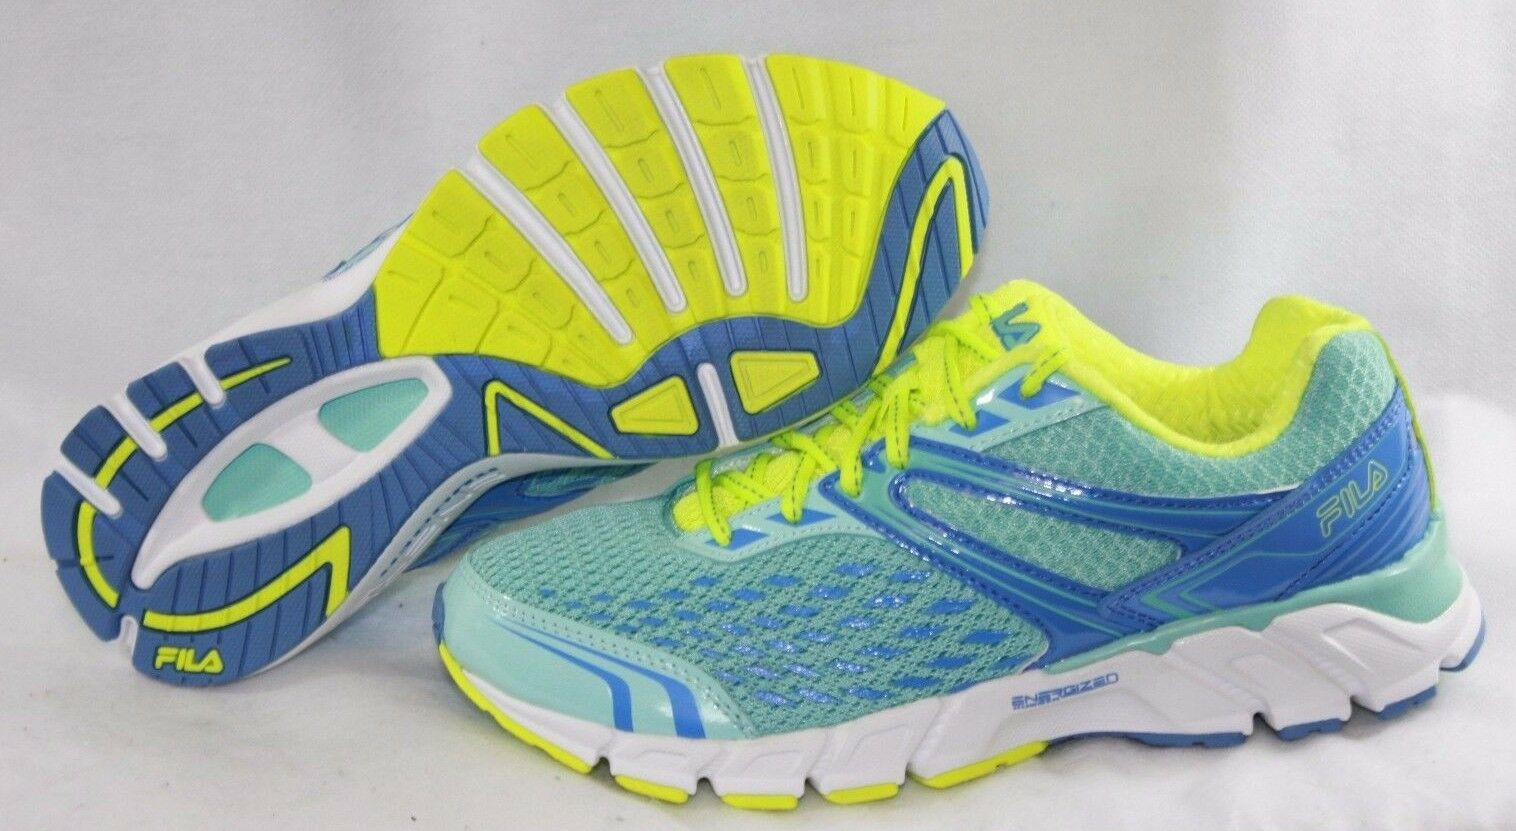 NEW Womens FILA Vellospeed Energized CoolMax Memory Foam Blue Sneakers Shoes Cheap women's shoes women's shoes